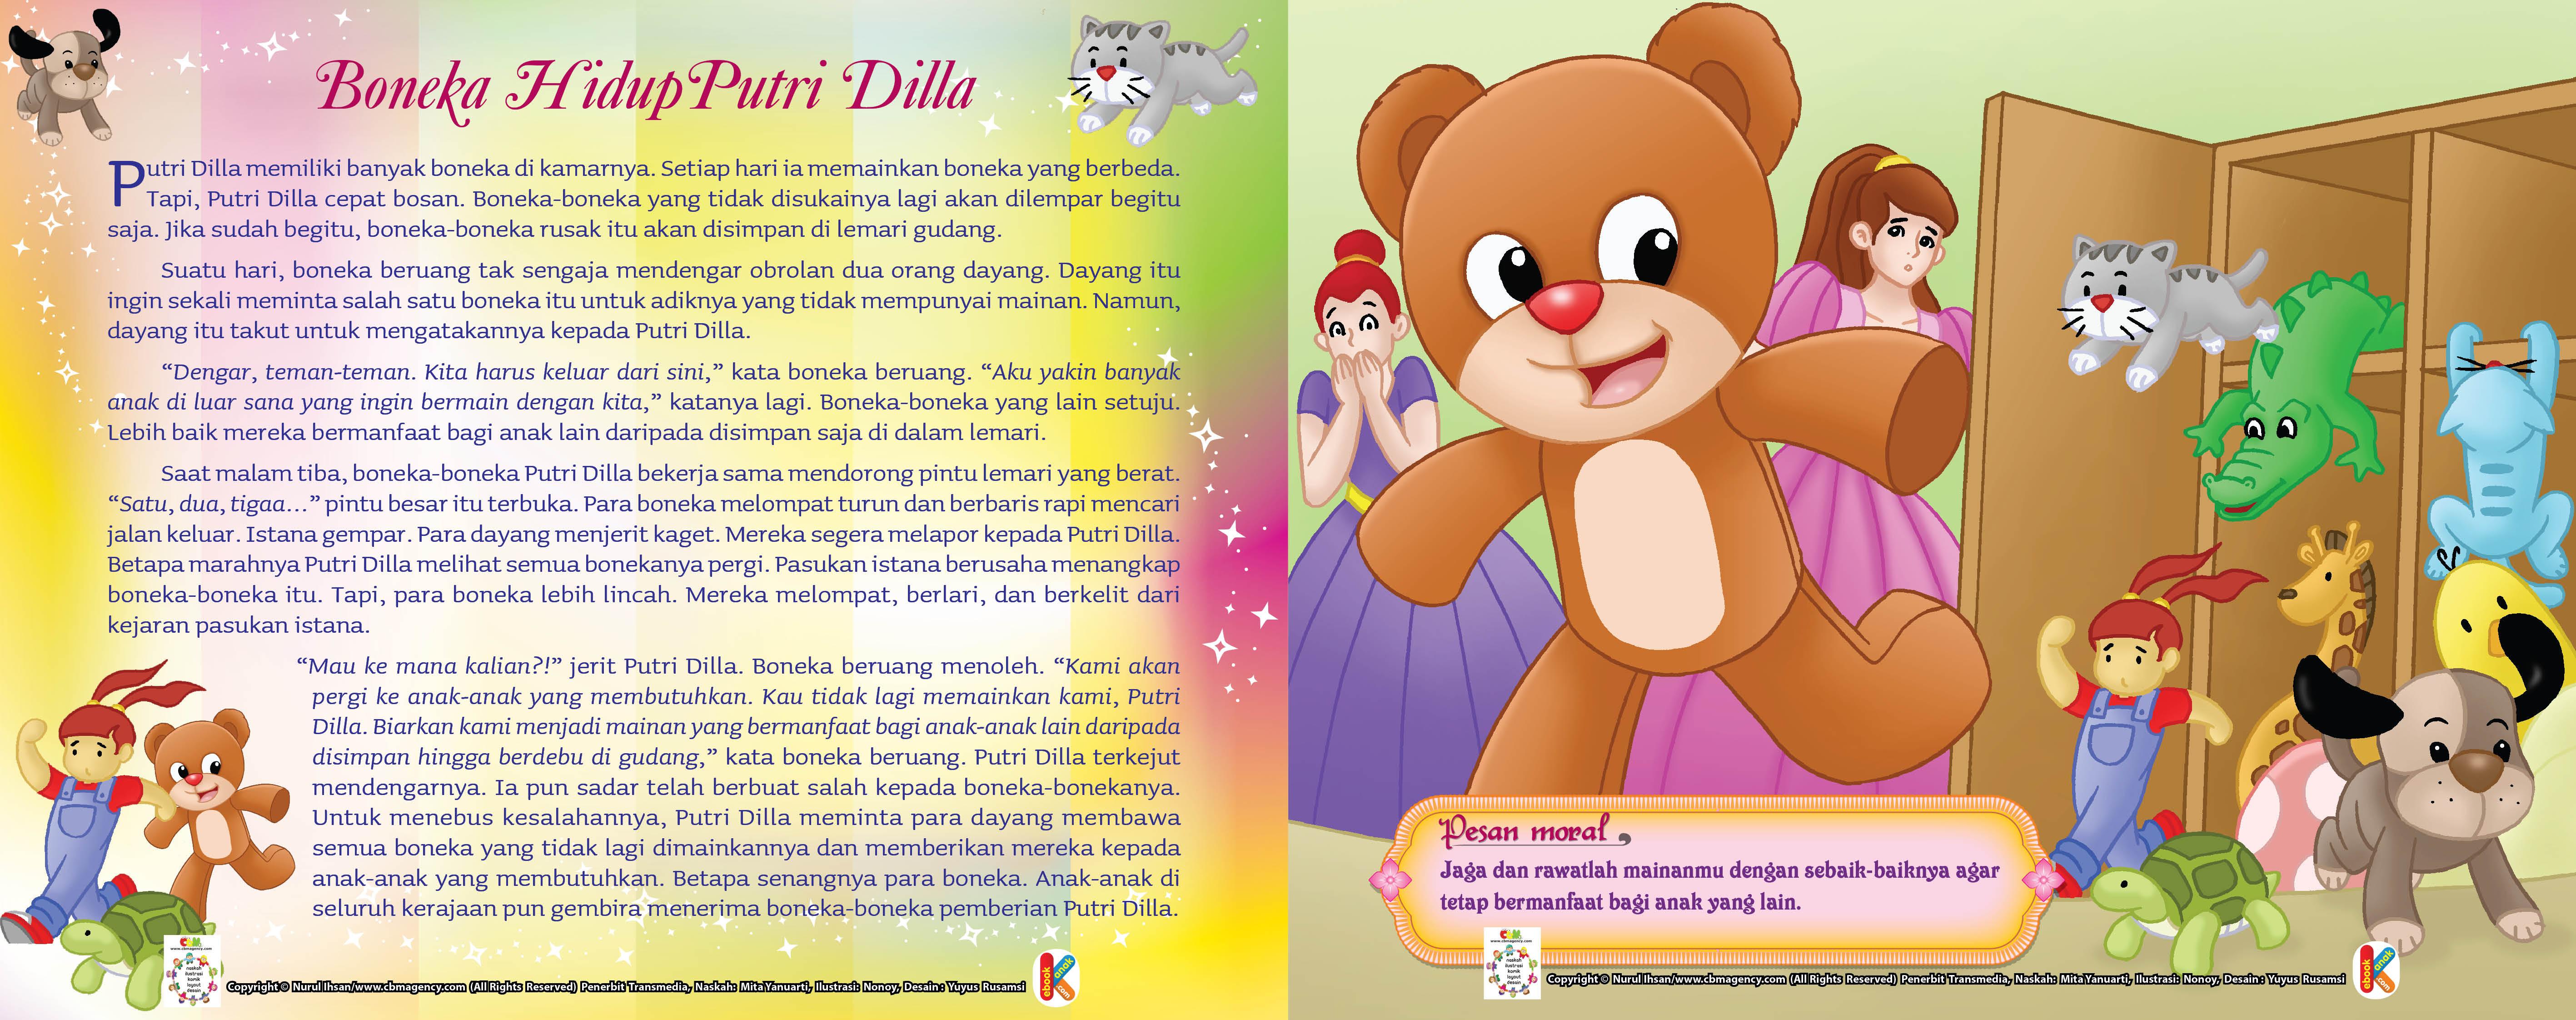 Tapi, Putri Dilla cepat bosan.